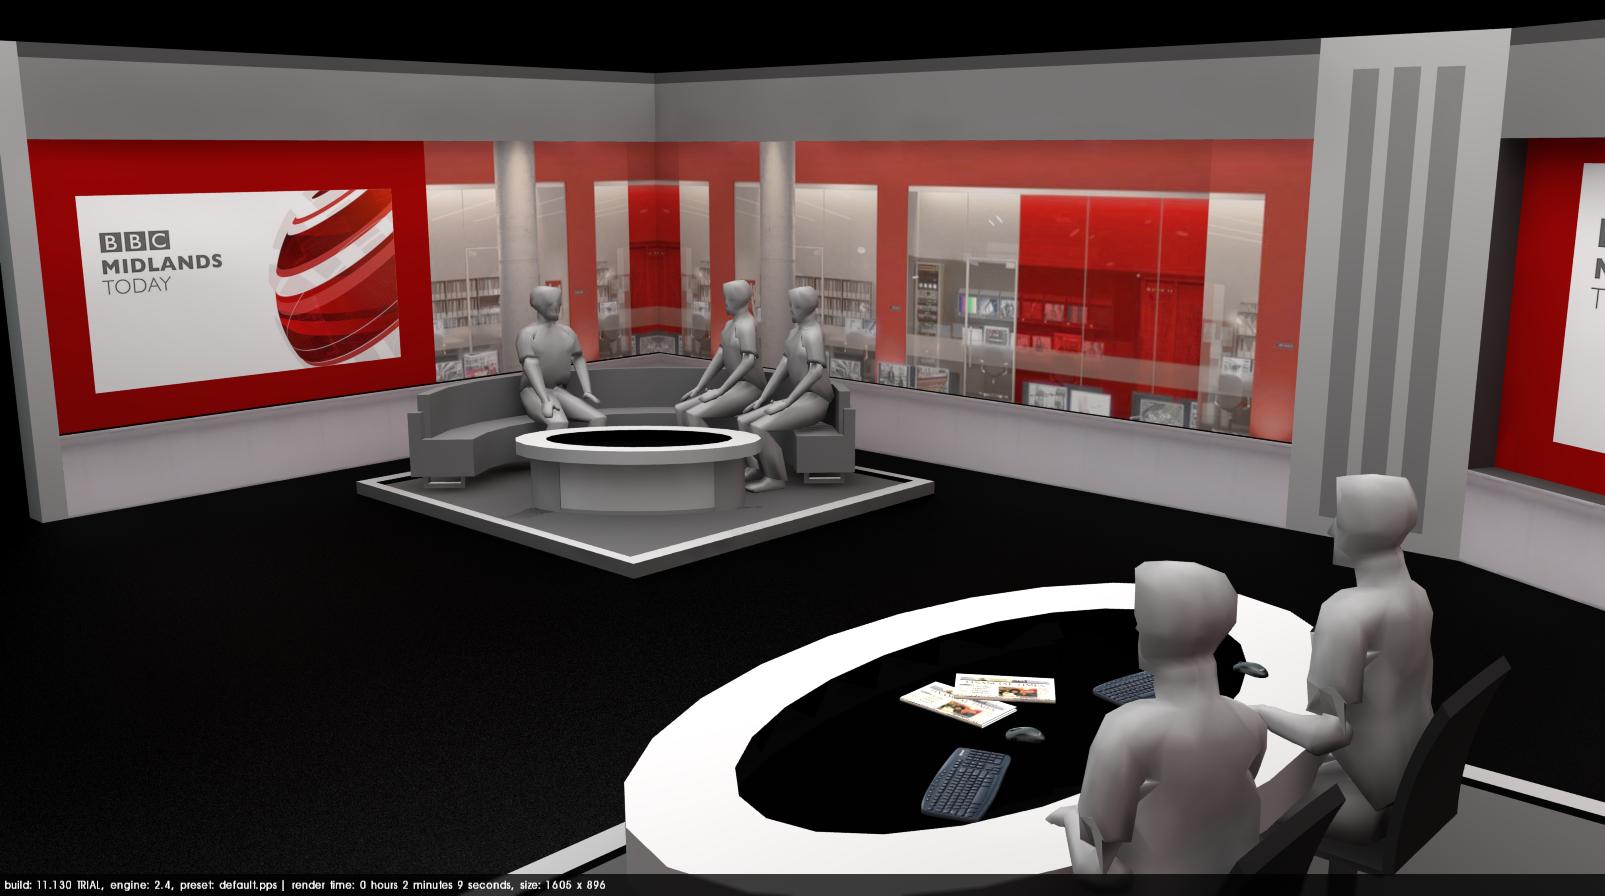 BBC Midlands Today New Studio Set Possible Idea TV Forum